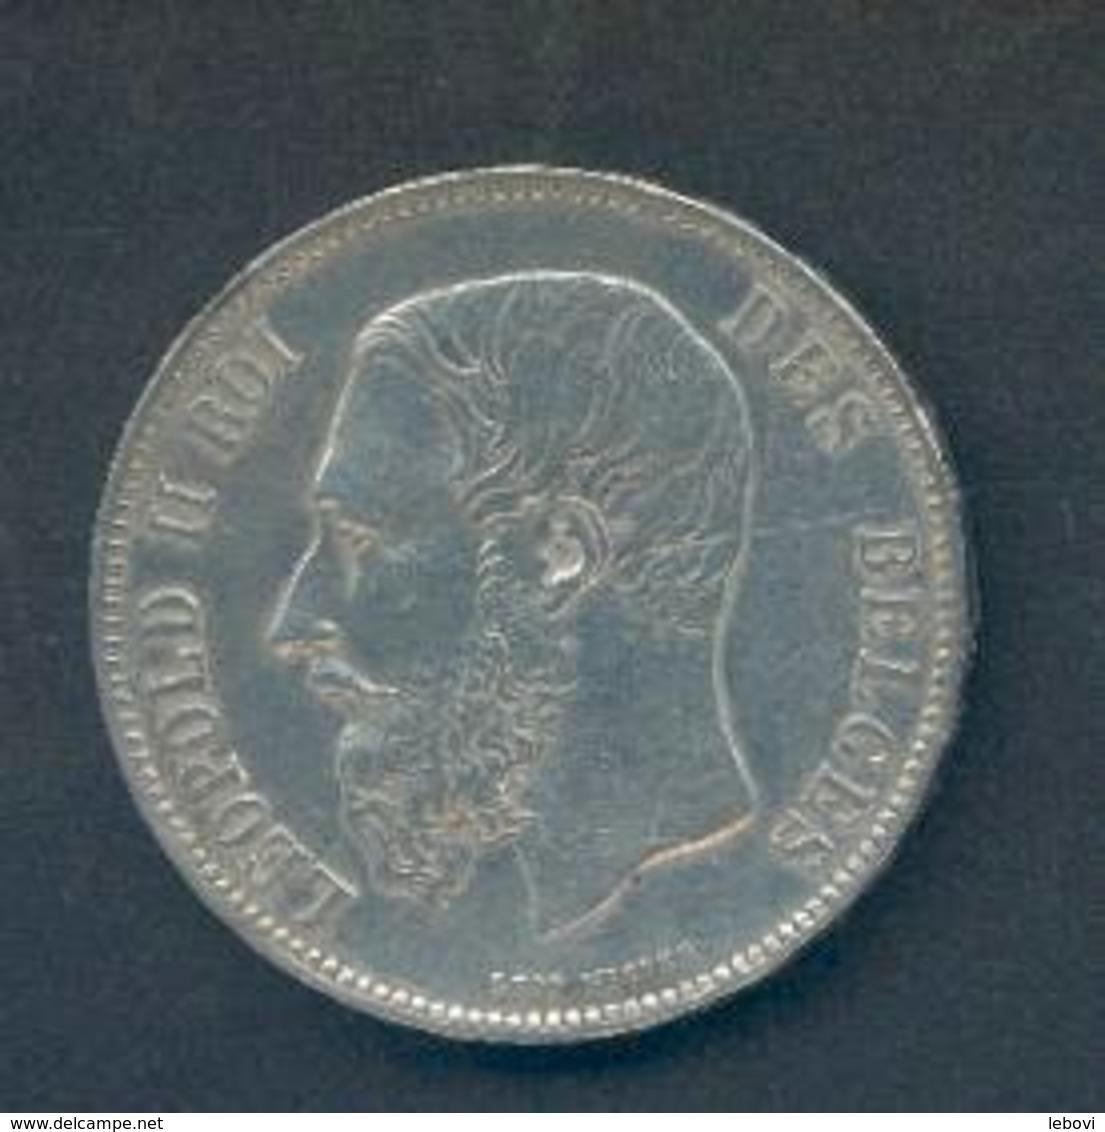 LEOPOLD II - 5 Francs 1873 « PROTEGE » Plus Espacé - 09. 5 Franchi